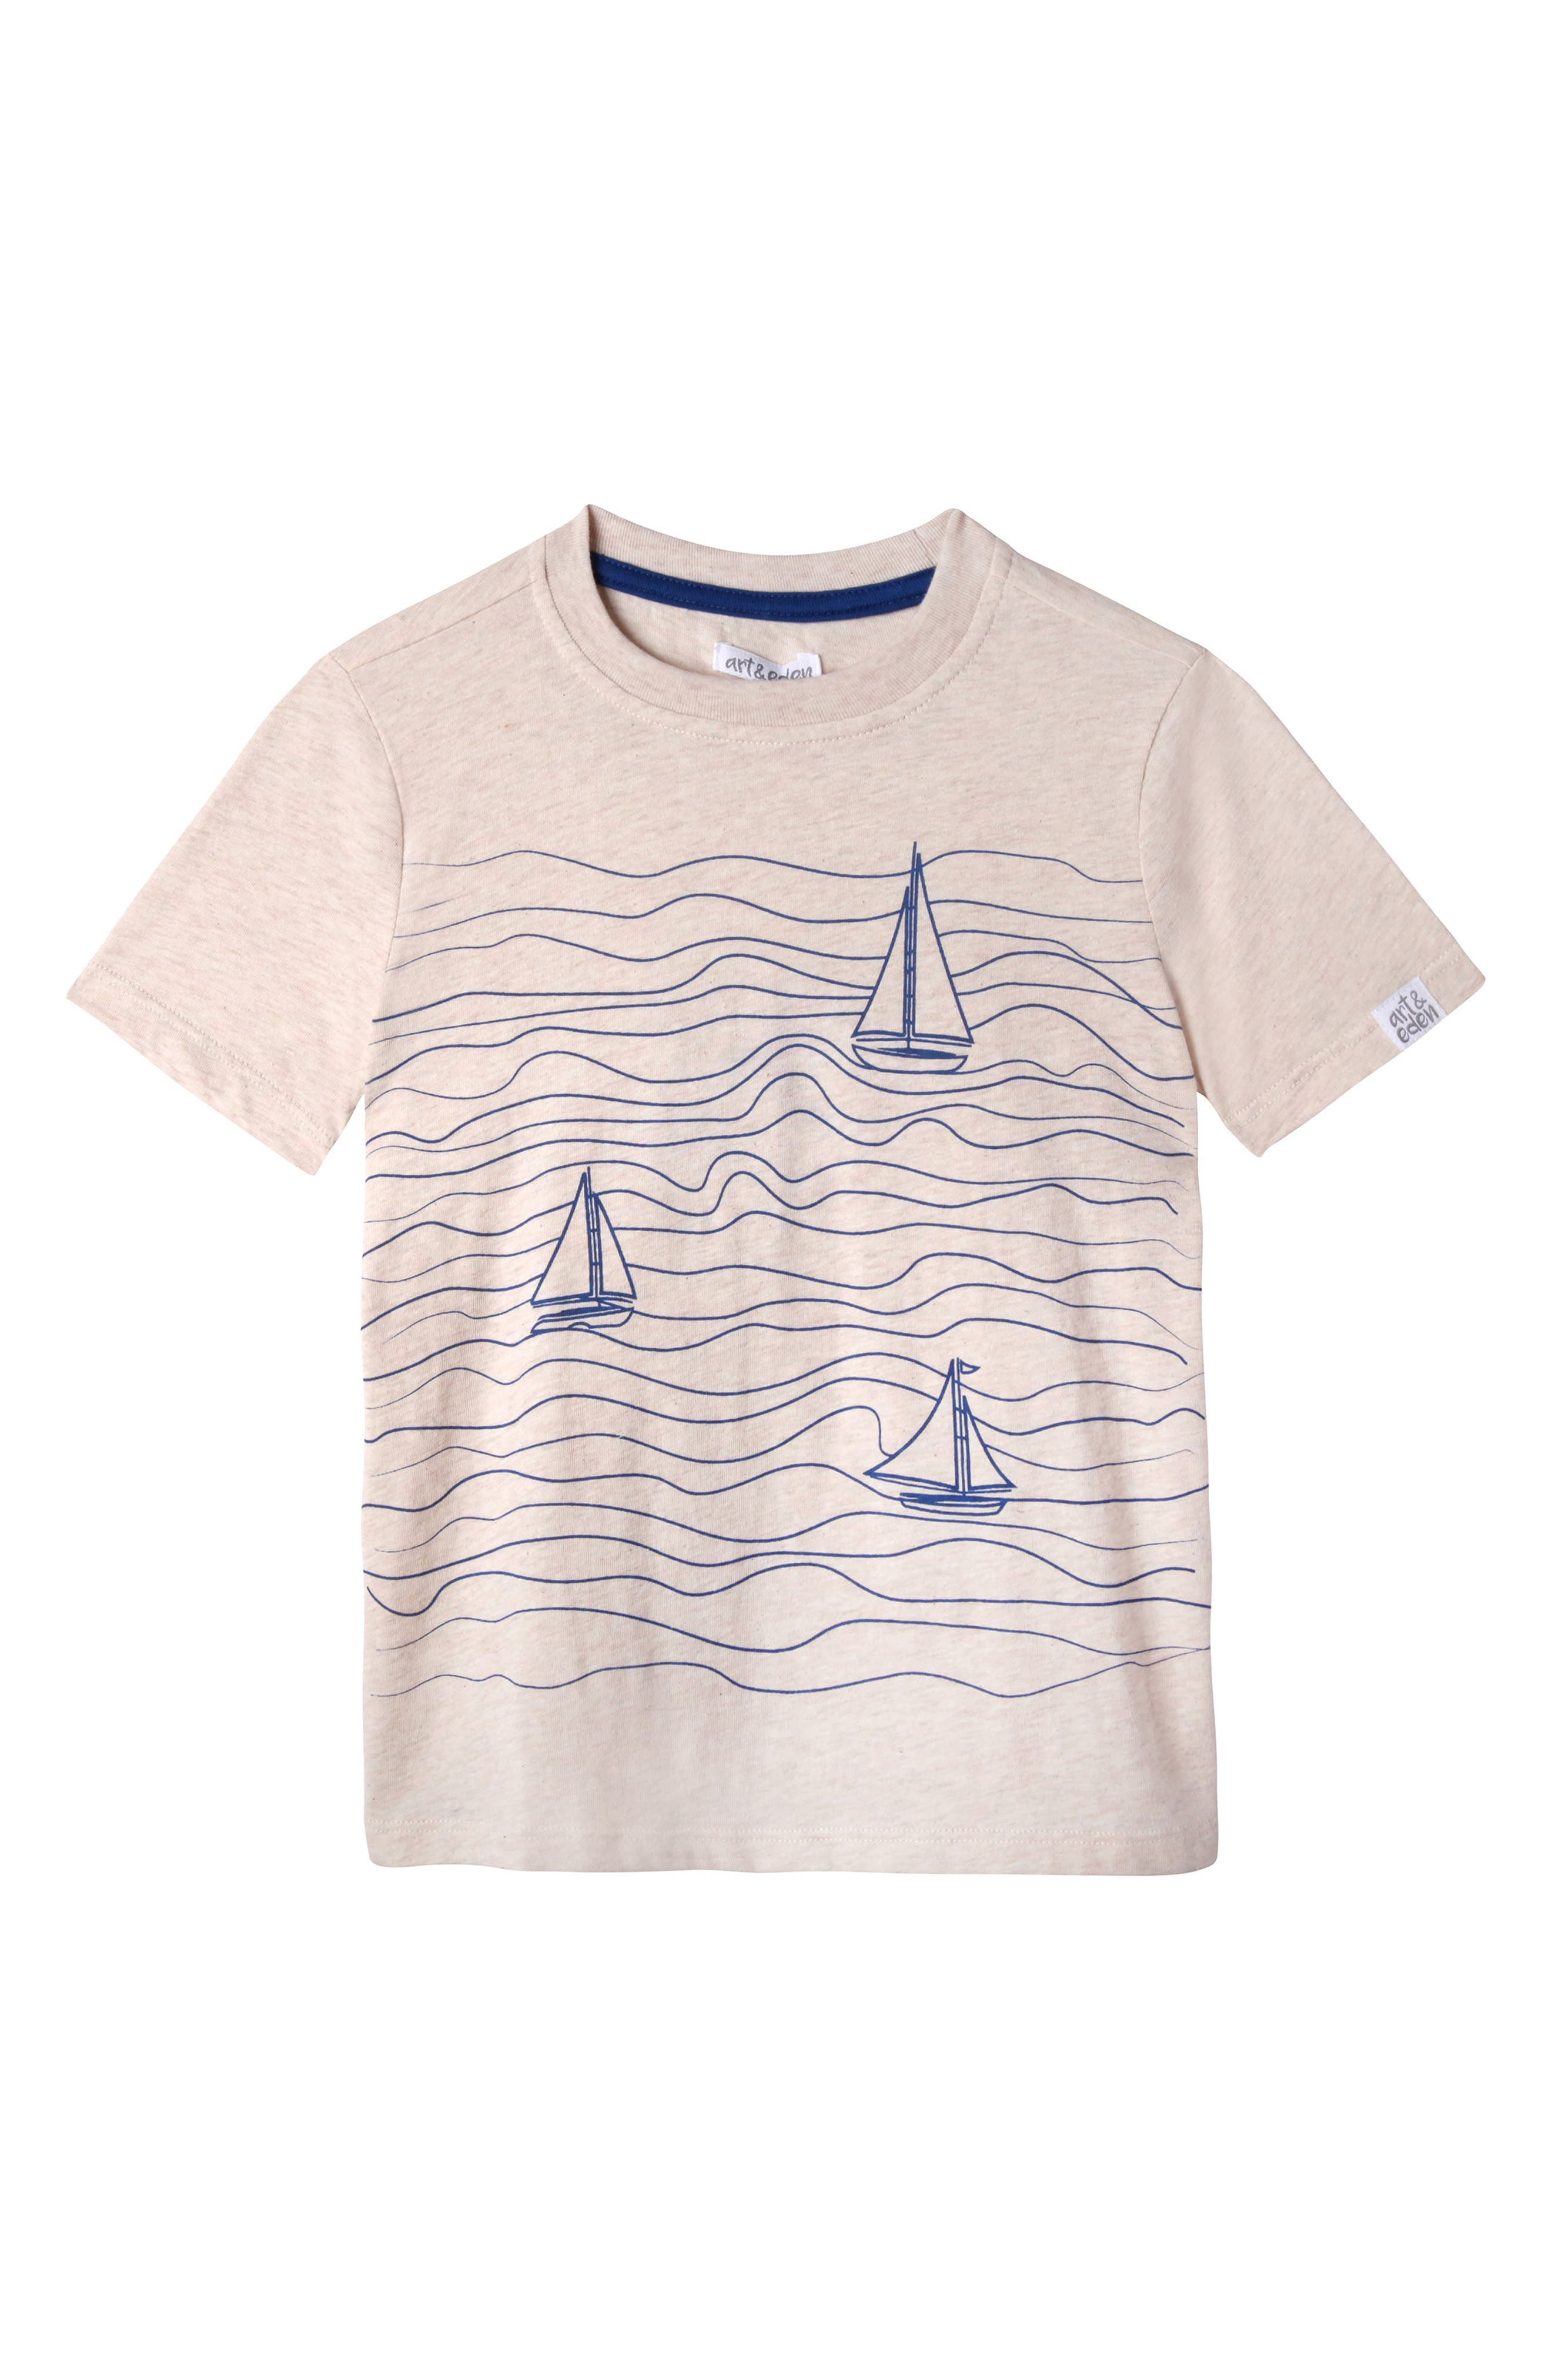 Jacob Sailboat Organic Cotton T-Shirt,                         Main,                         color, Oatmeal Heather